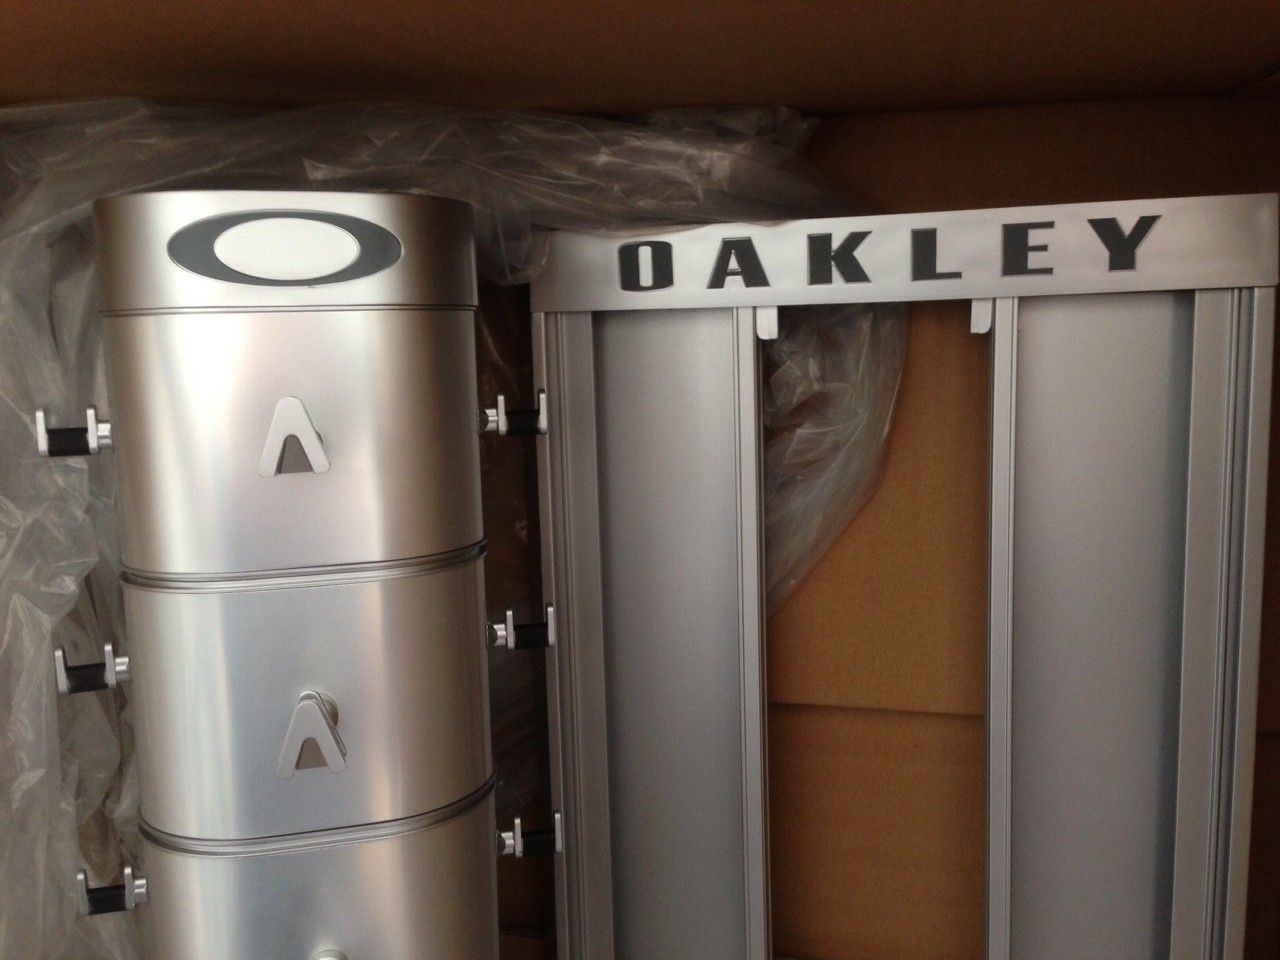 New in Box Oakley Counter Display - IMG_7815.JPG